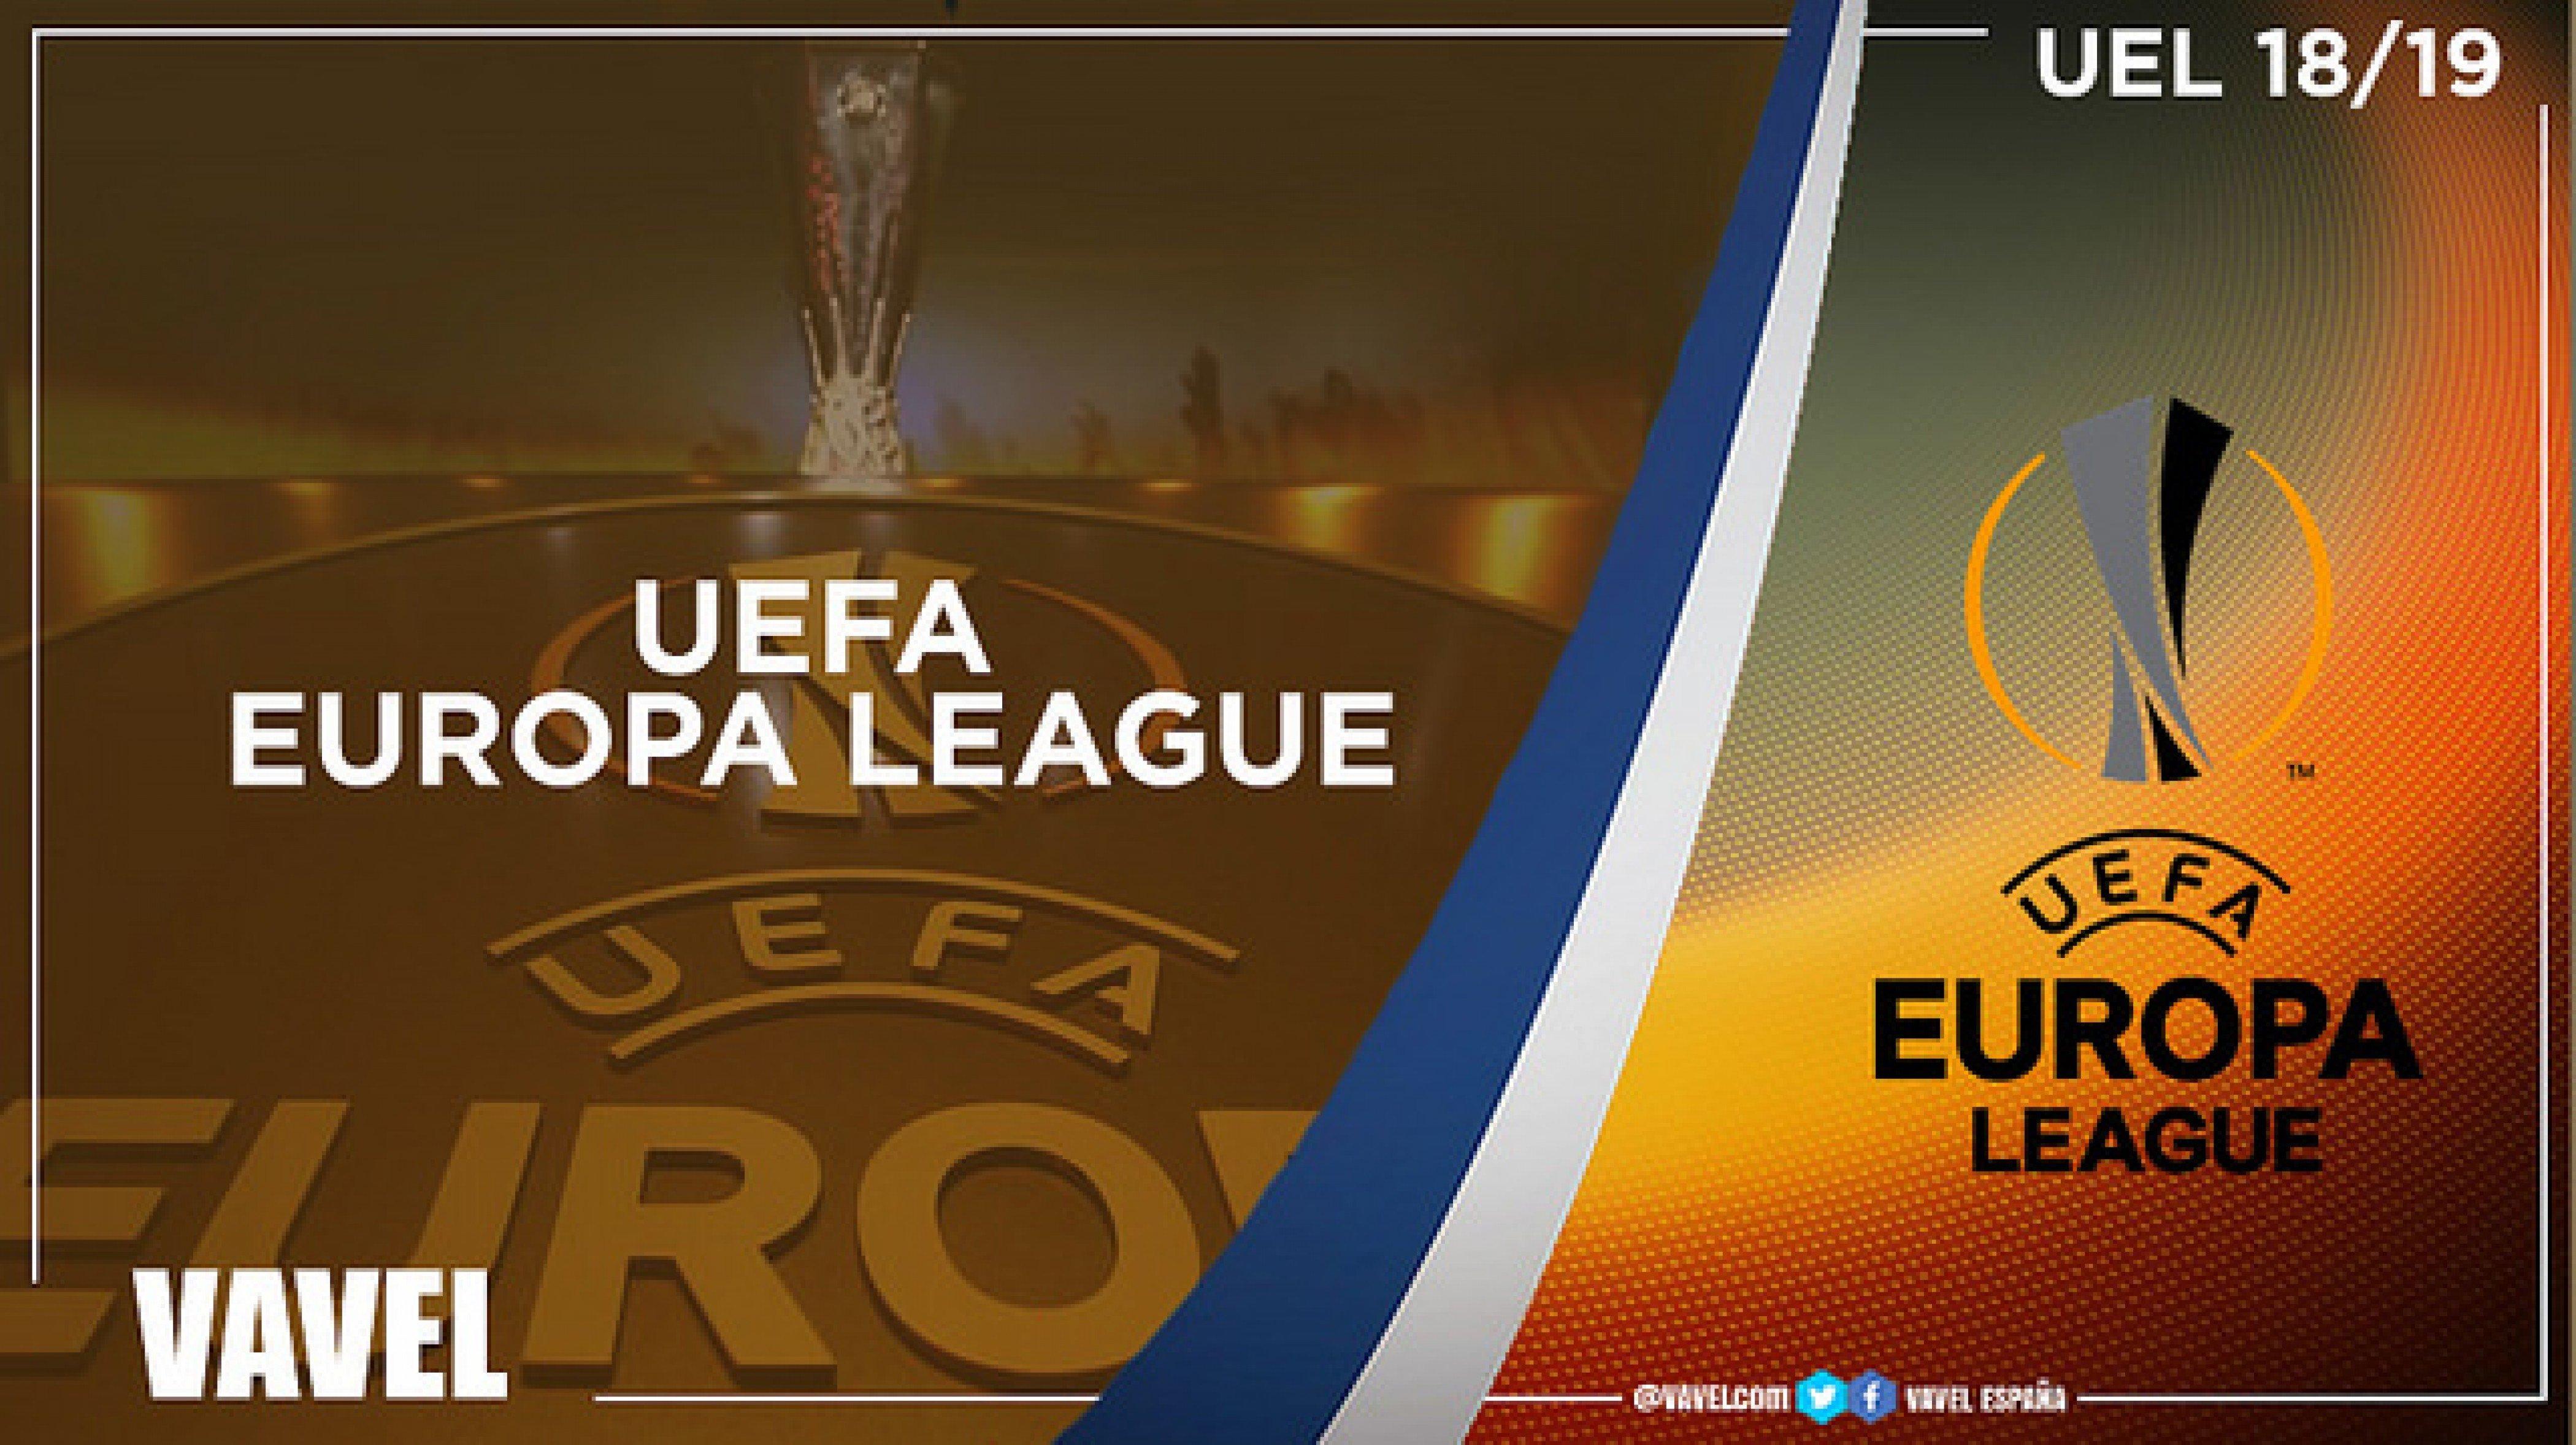 Arsenal 4-2 Vorskla: Gunners in the goals as Europa League kicks off